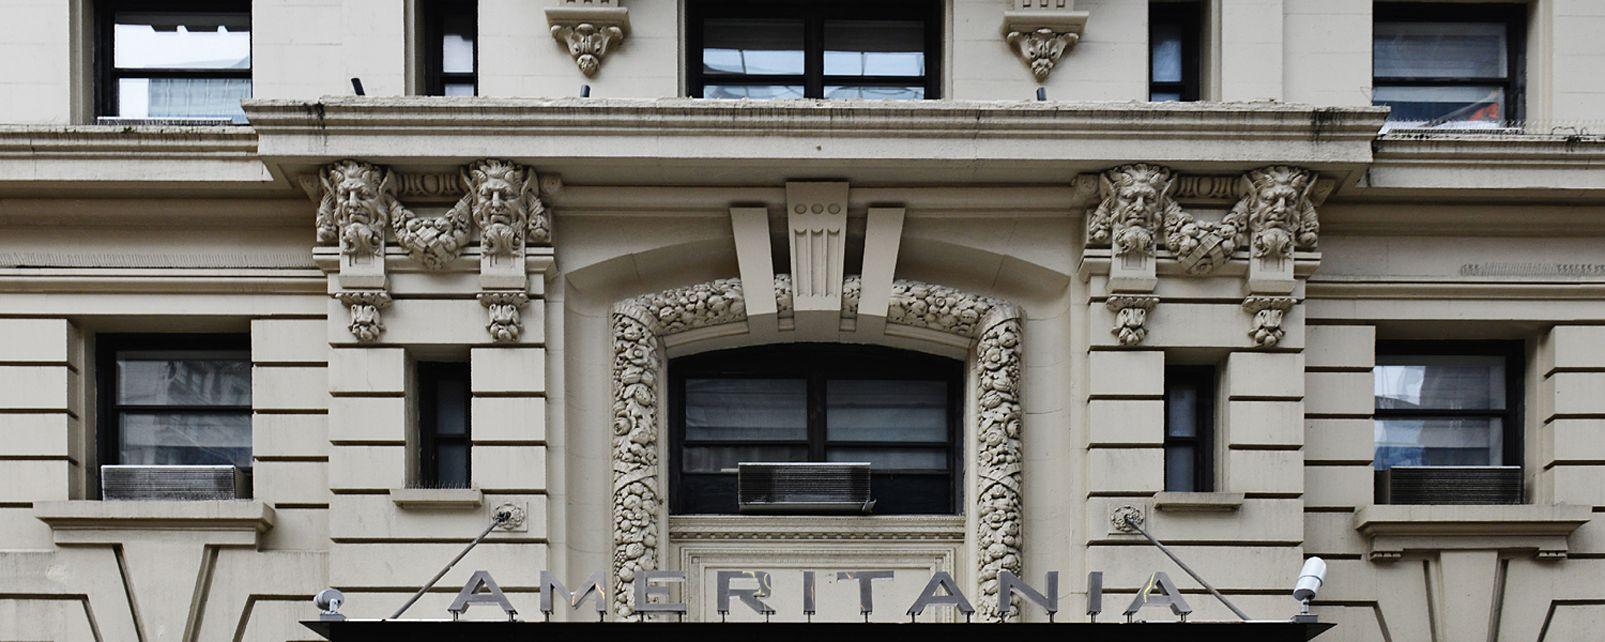 Hôtel Ameritania